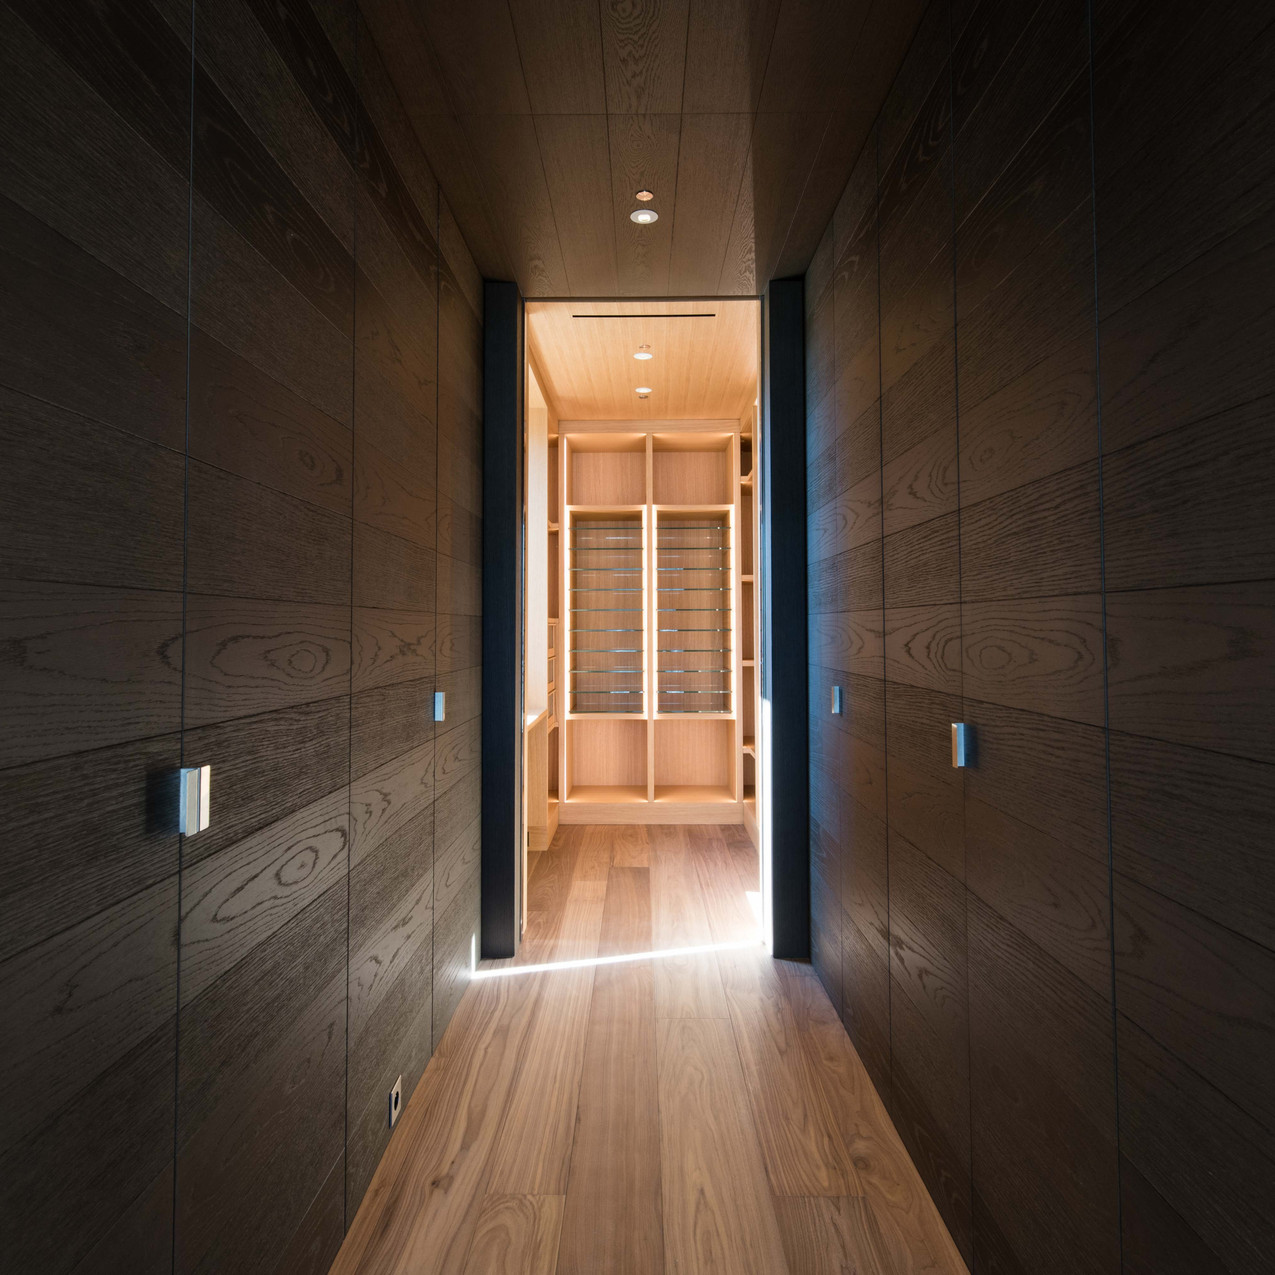 photographe architecture nice france french riviera paca cote dazur interieur-6